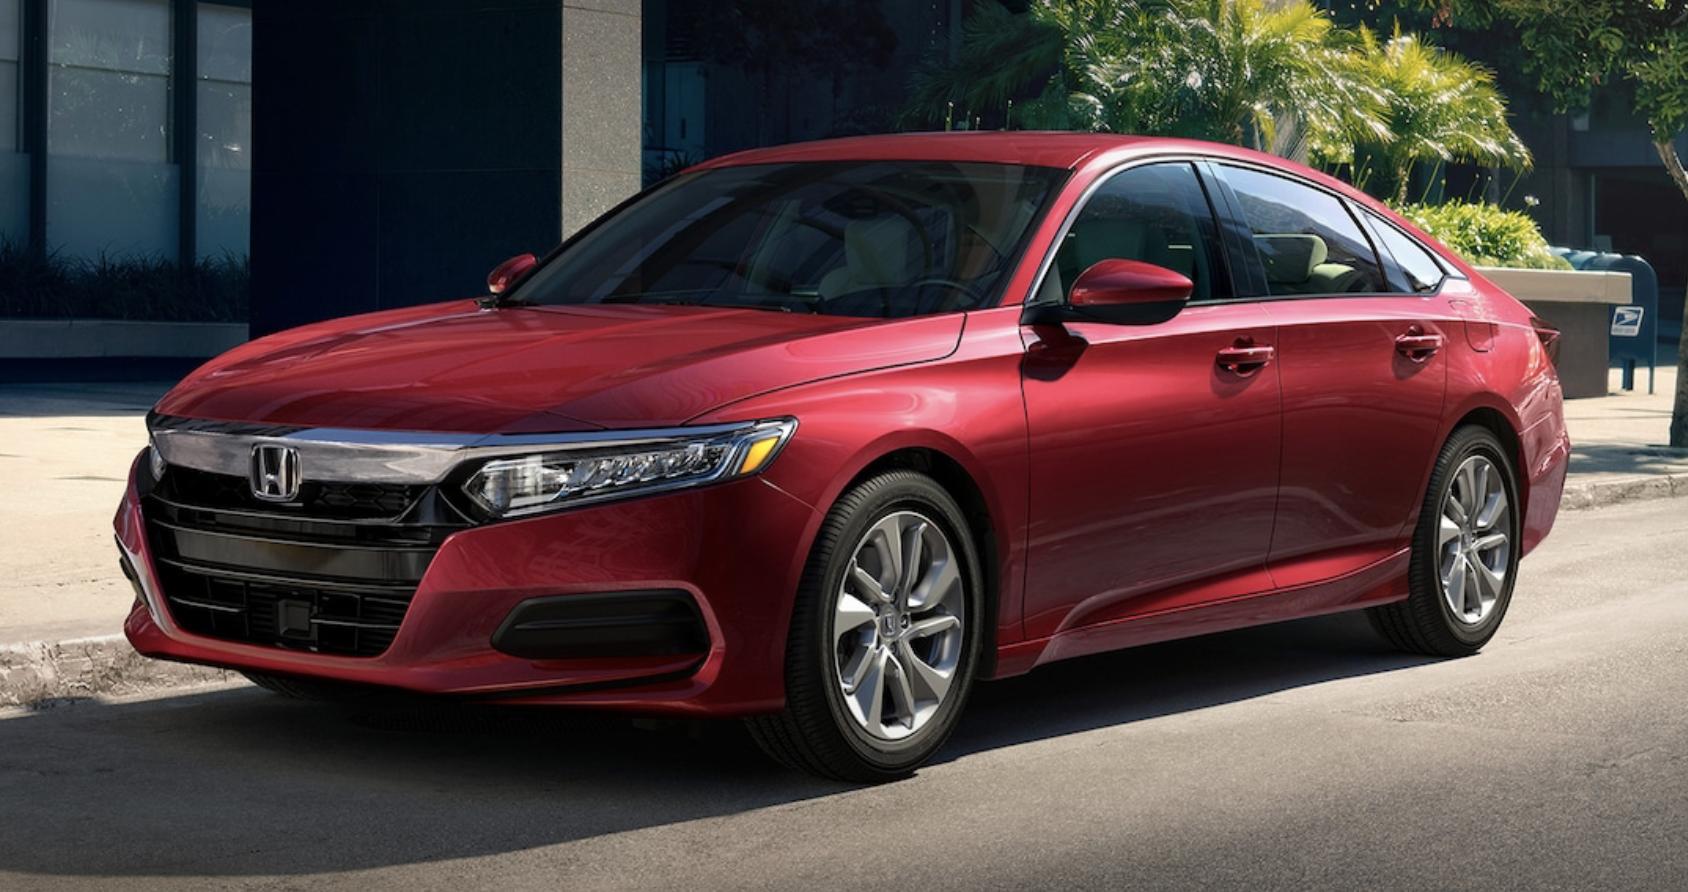 2020 Honda Accord in 2020 Honda accord coupe, Honda